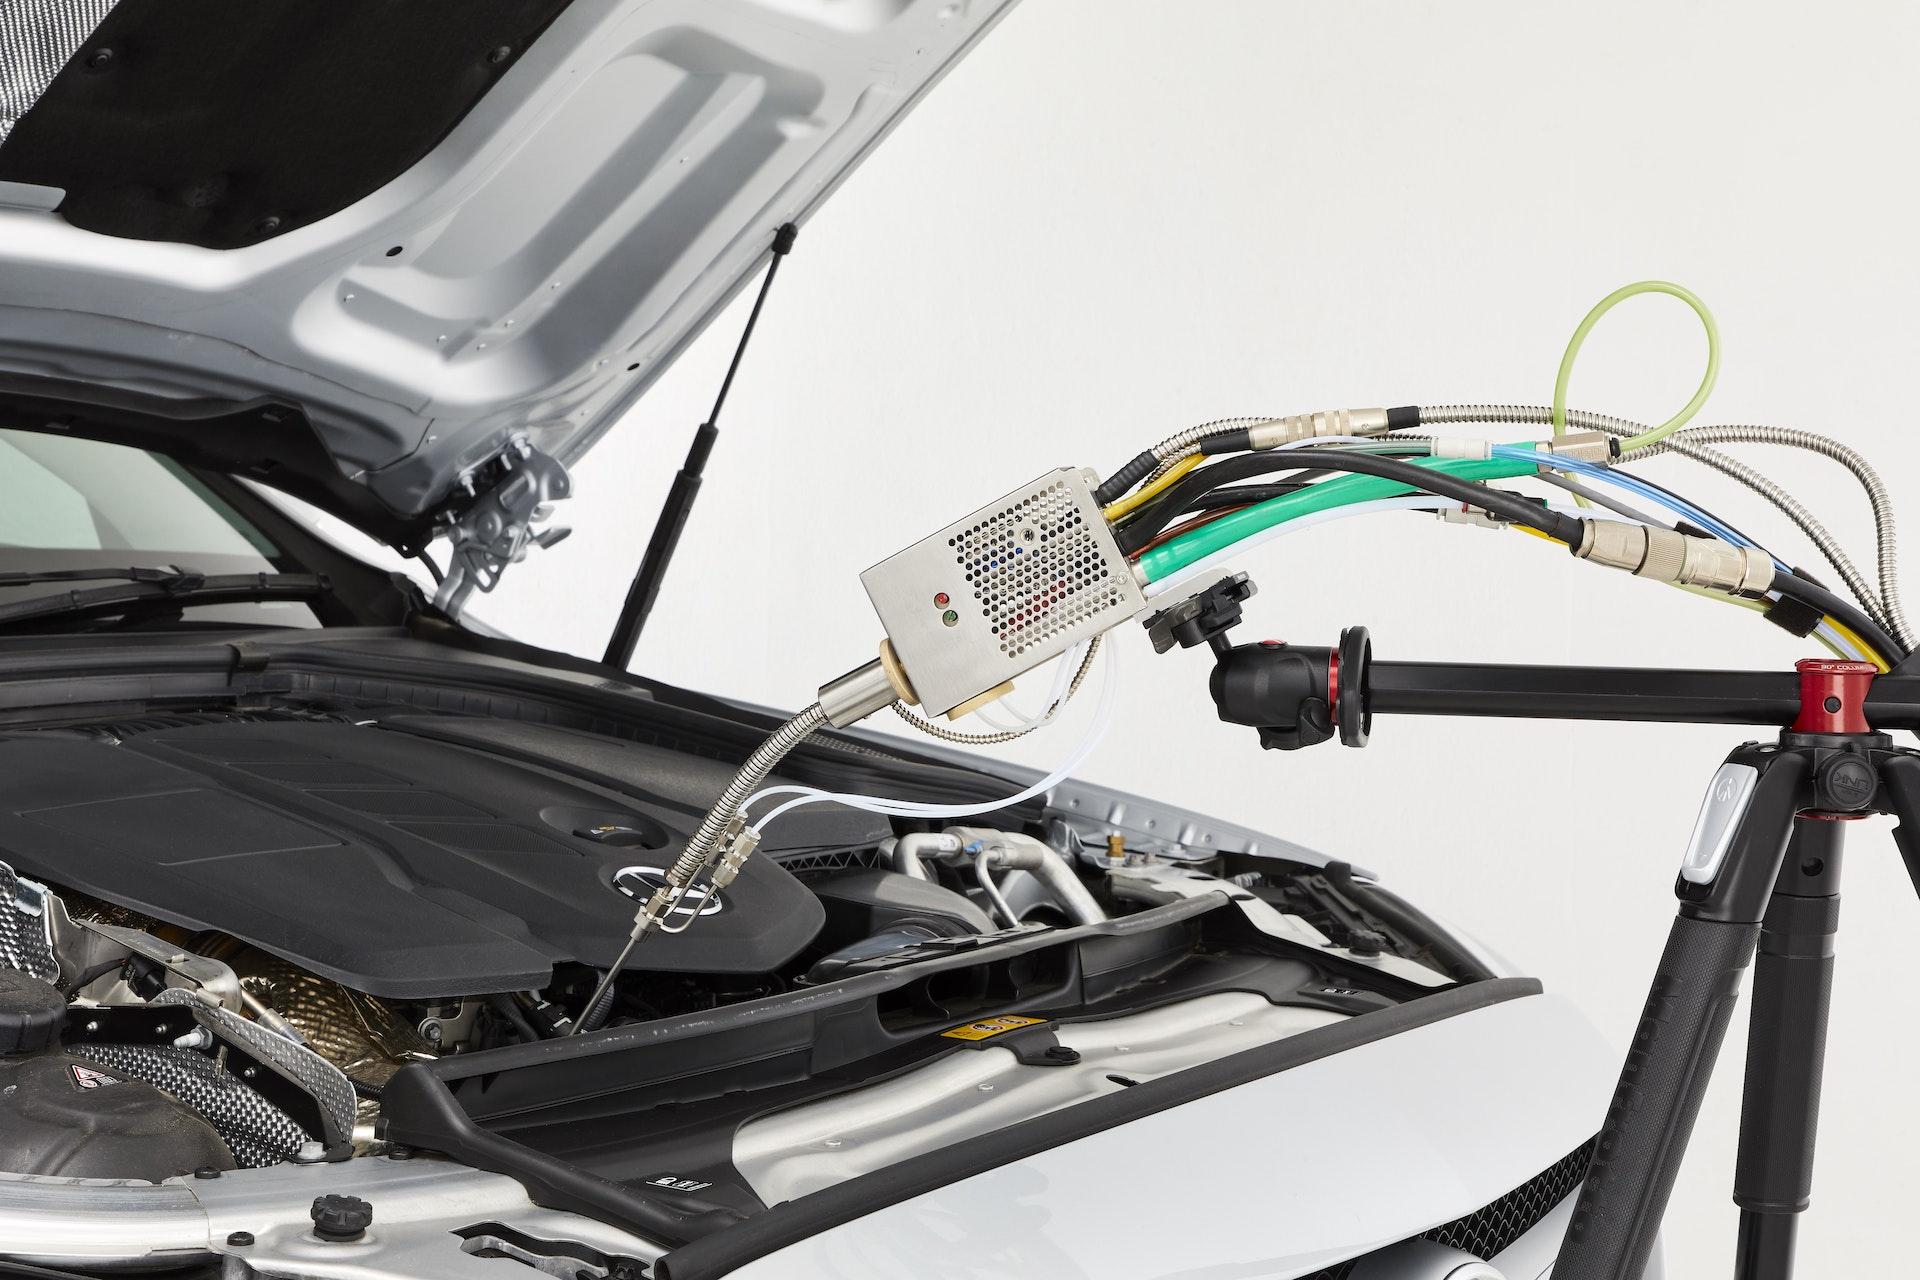 Cambustion HFR500 sample head sampling from vehicle engine bay